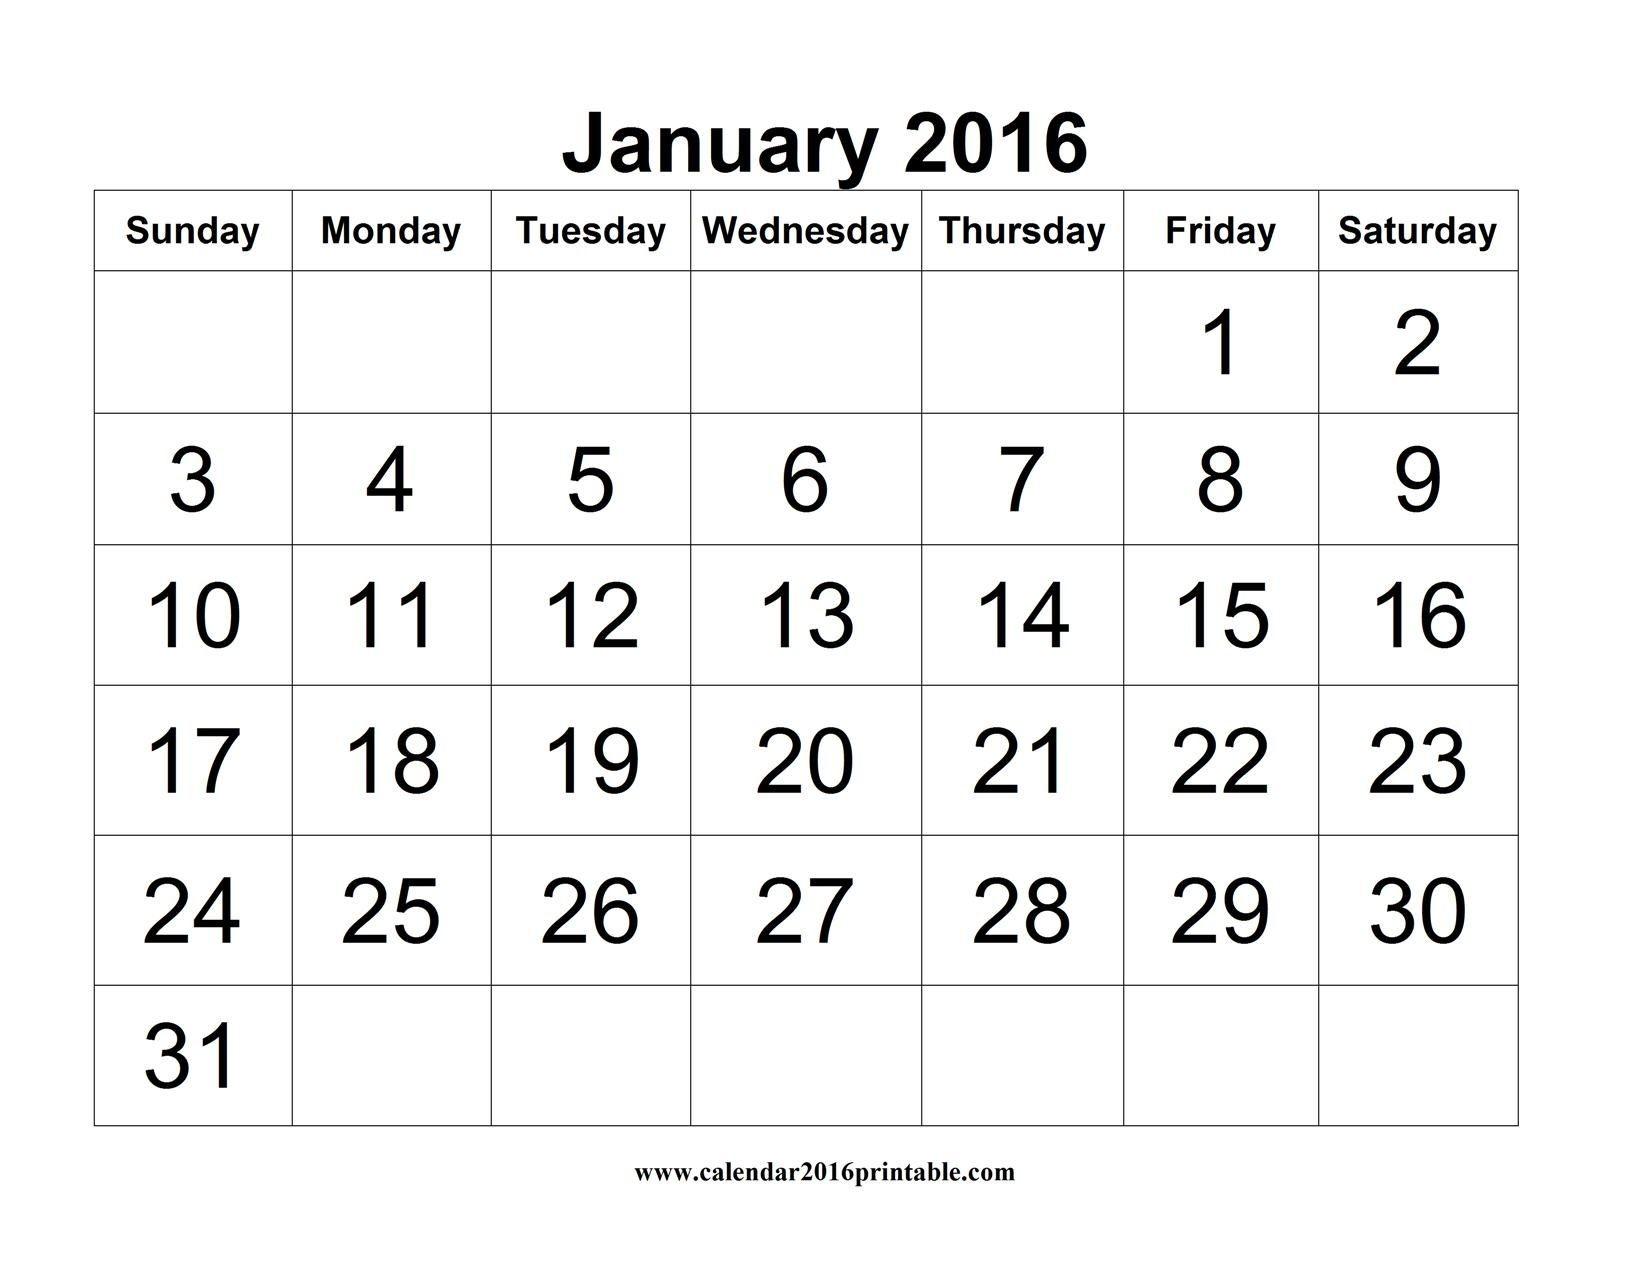 Calendario Para Imprimir 2017 Argentina Actual January 2016 Calendar Printable Excel Free to and Print Of Calendario Para Imprimir 2017 Argentina Más Arriba-a-fecha Mejores 101 Imágenes De Emprende Varios En Pinterest